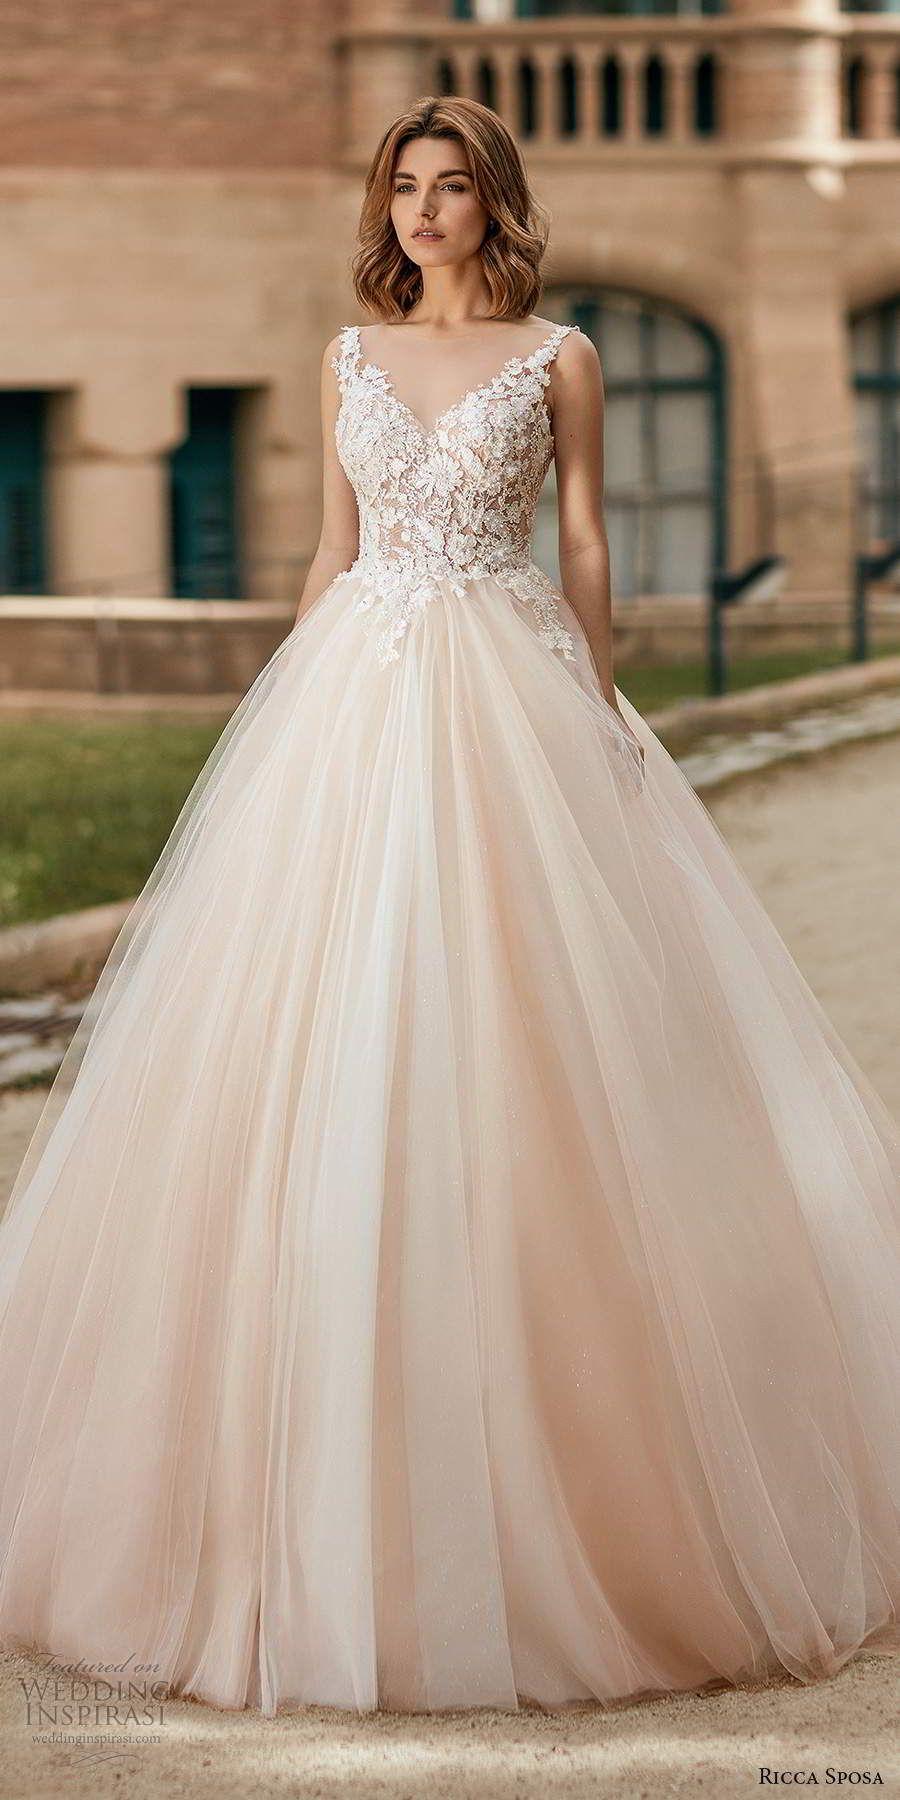 Weddinginspirasi.com featuring - ricca sposa 2020 barcelona bridal sleeveless straps sweetheart neckline heavily embellished bodice pink a line ball gown wedding